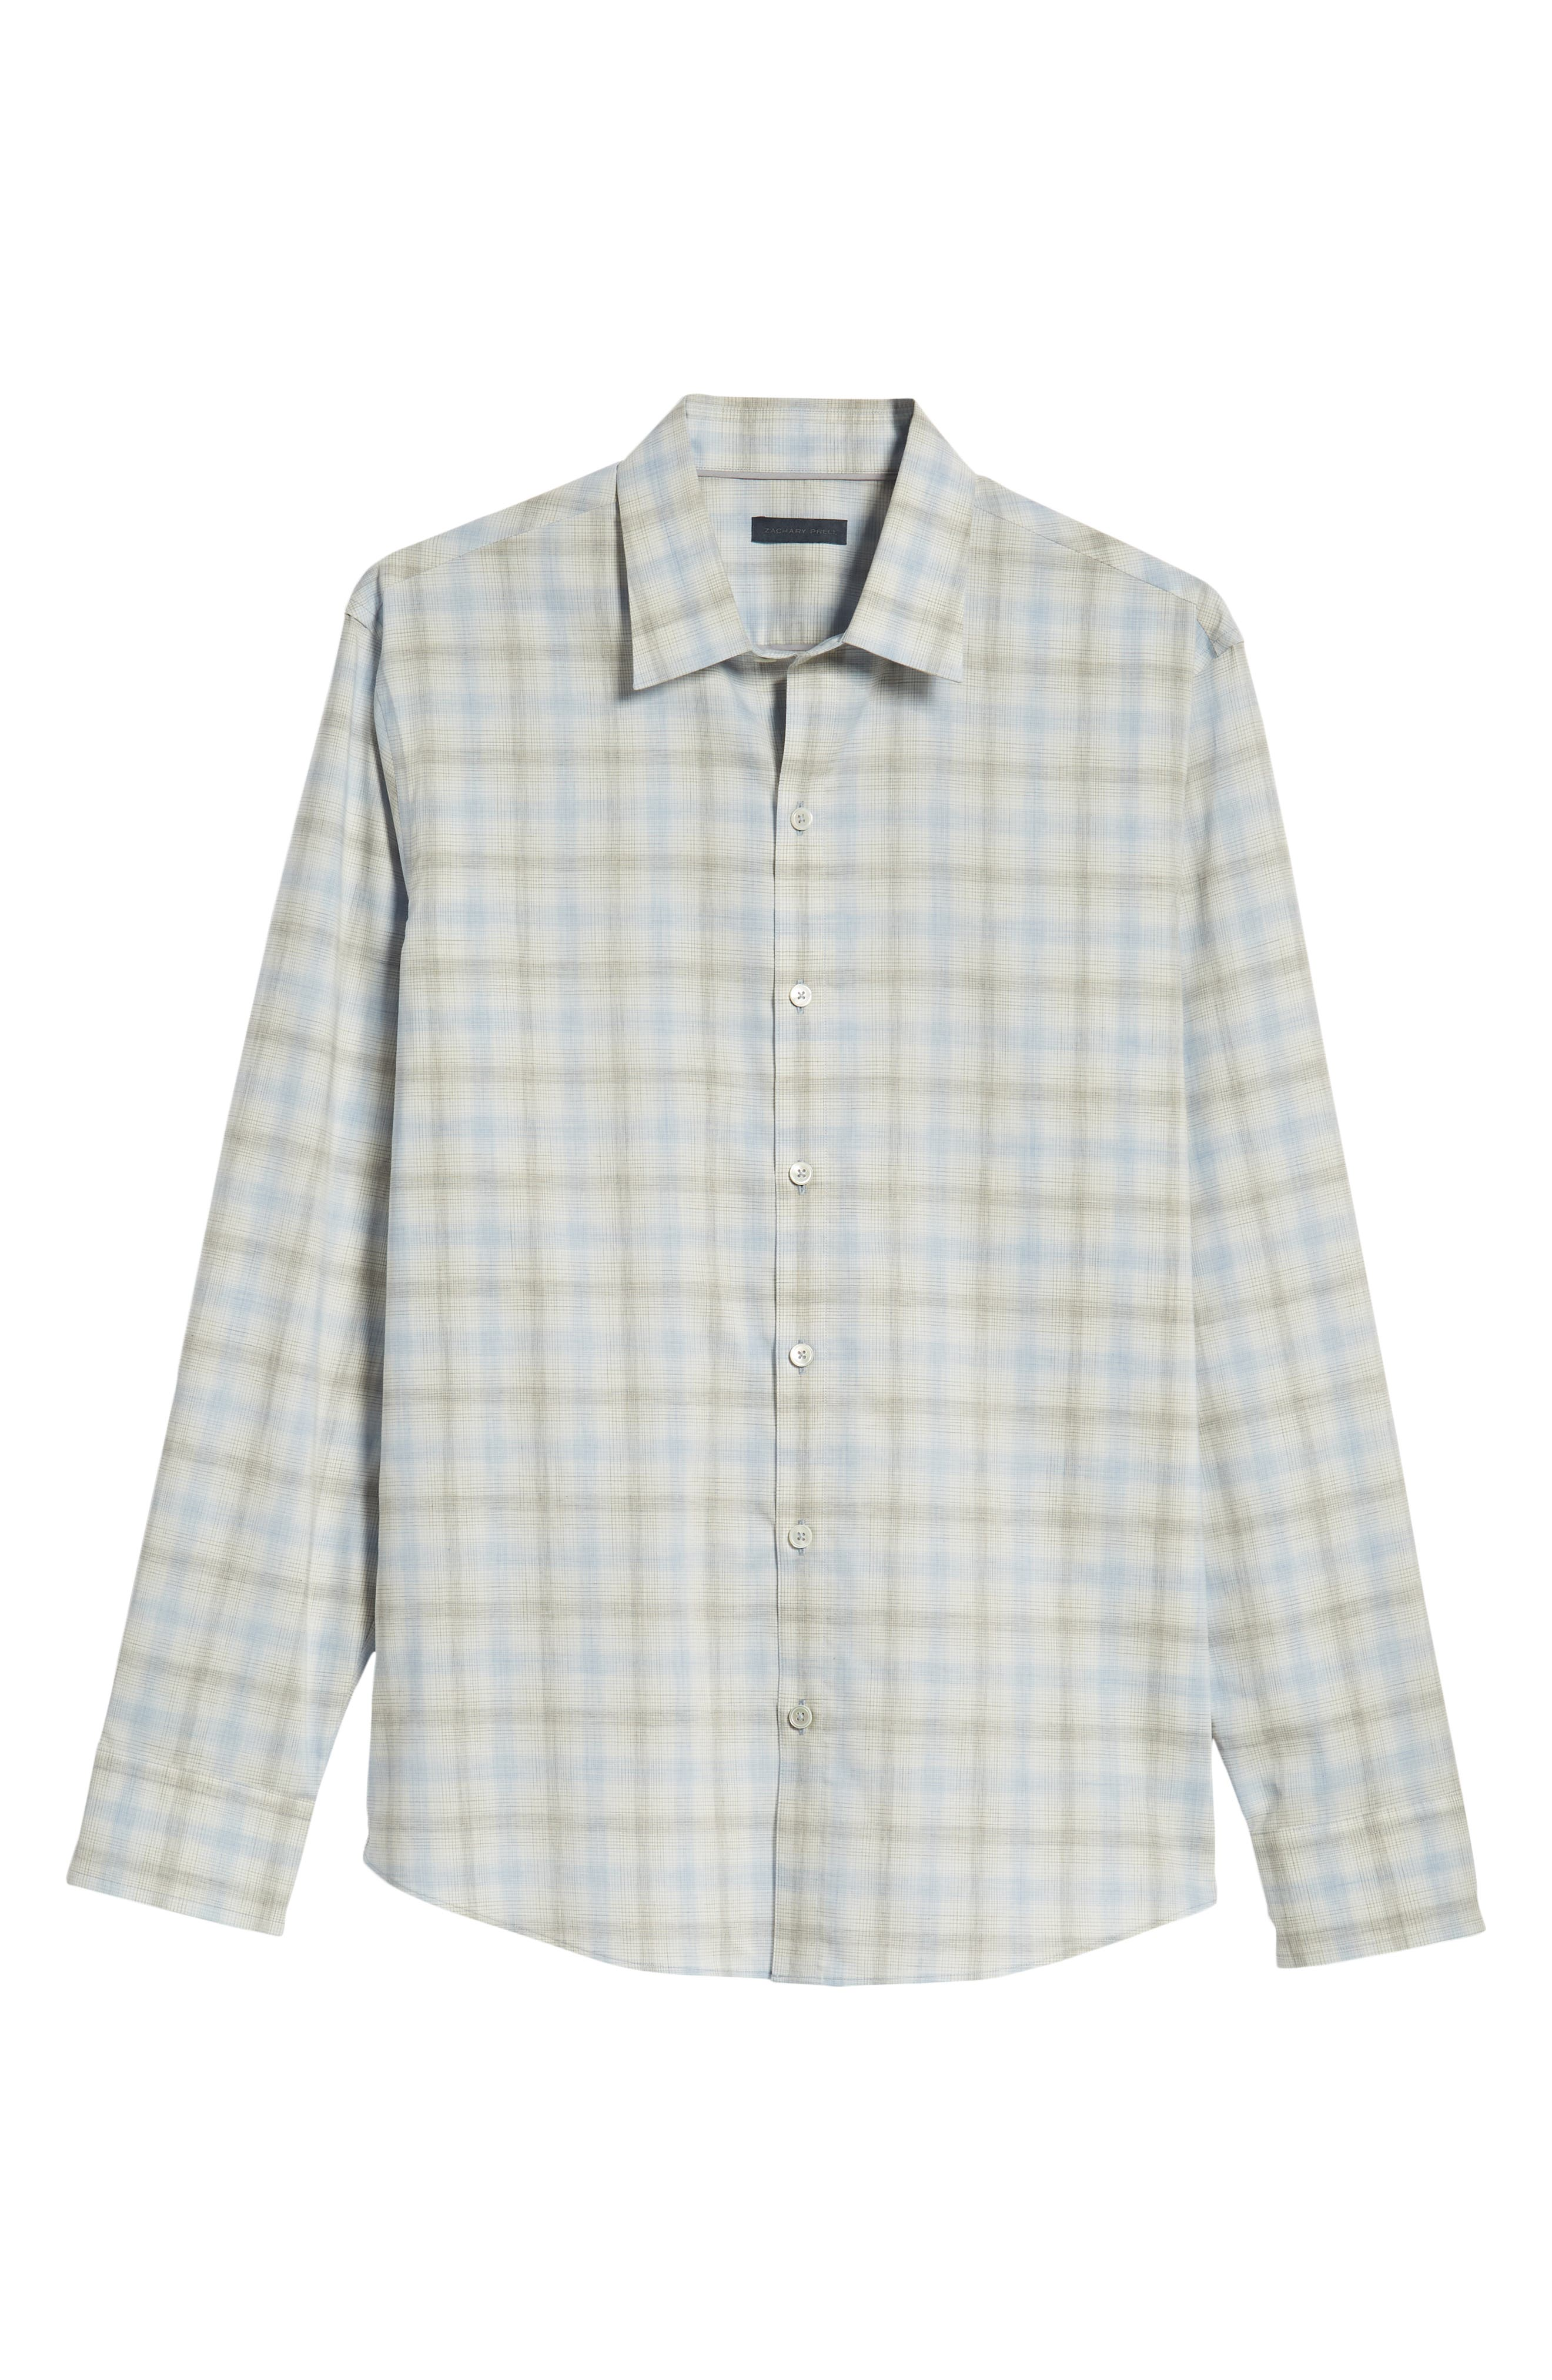 Mourad Regular Fit Sport Shirt,                             Alternate thumbnail 5, color,                             LIGHT GREY